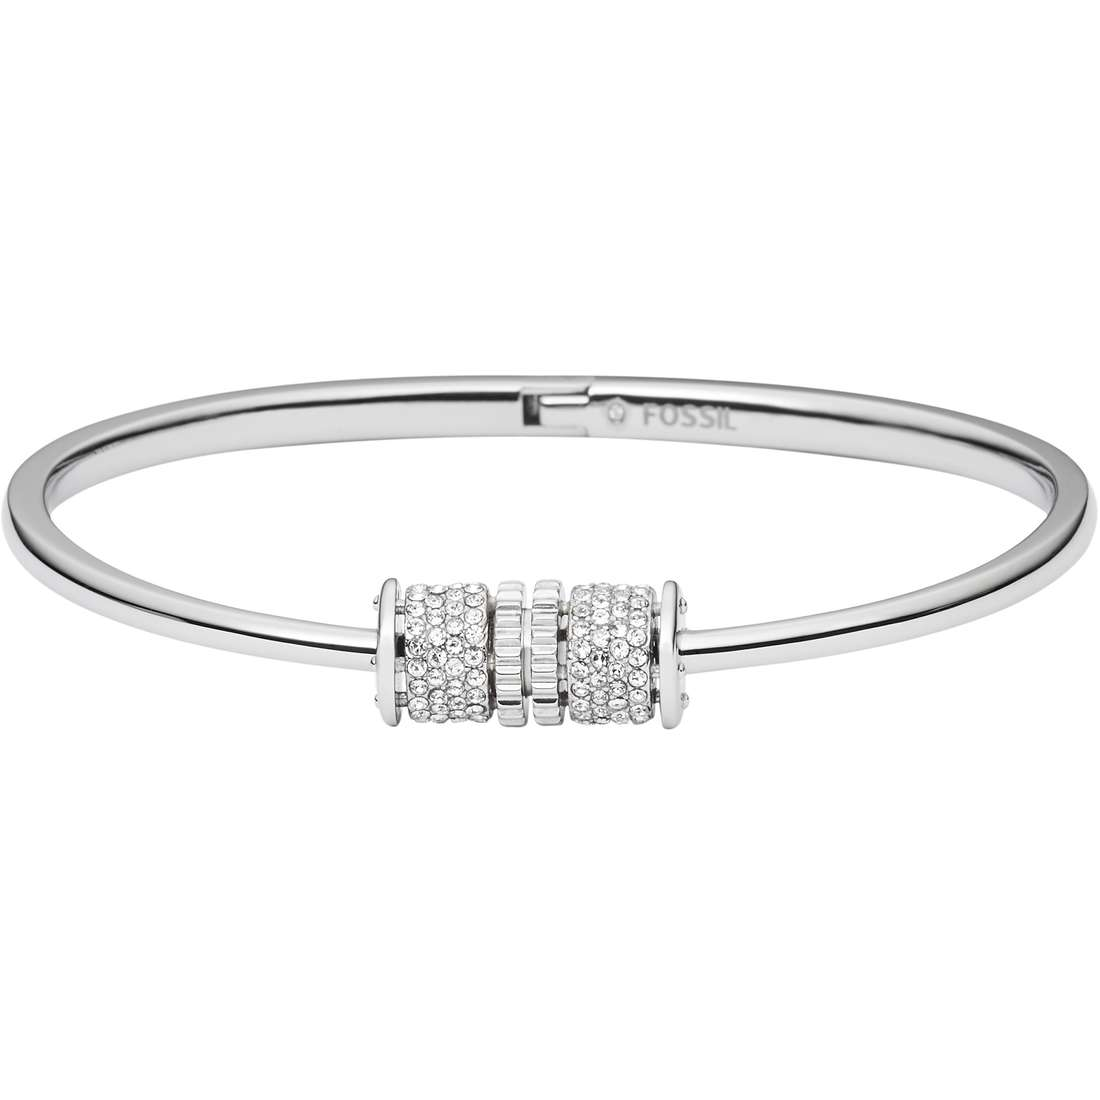 bracelet woman jewellery Fossil Spring 16 JF02237040